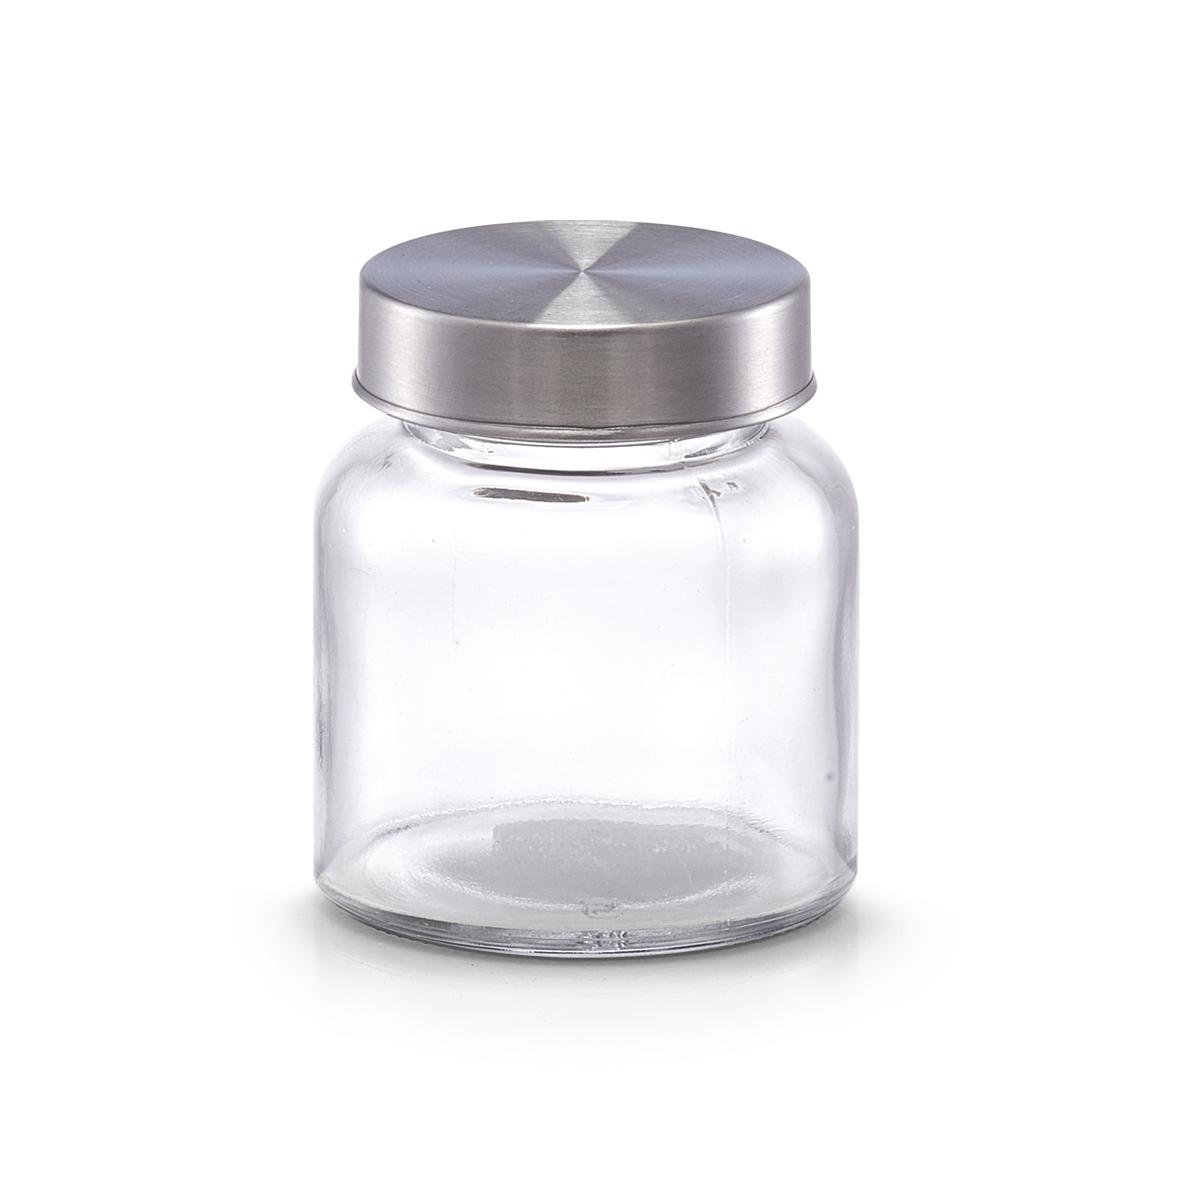 Recipient pentru depozitare din sticla Mini, capac metalic, 150 ml, Ø 6,8xH7,8 cm( 474757)